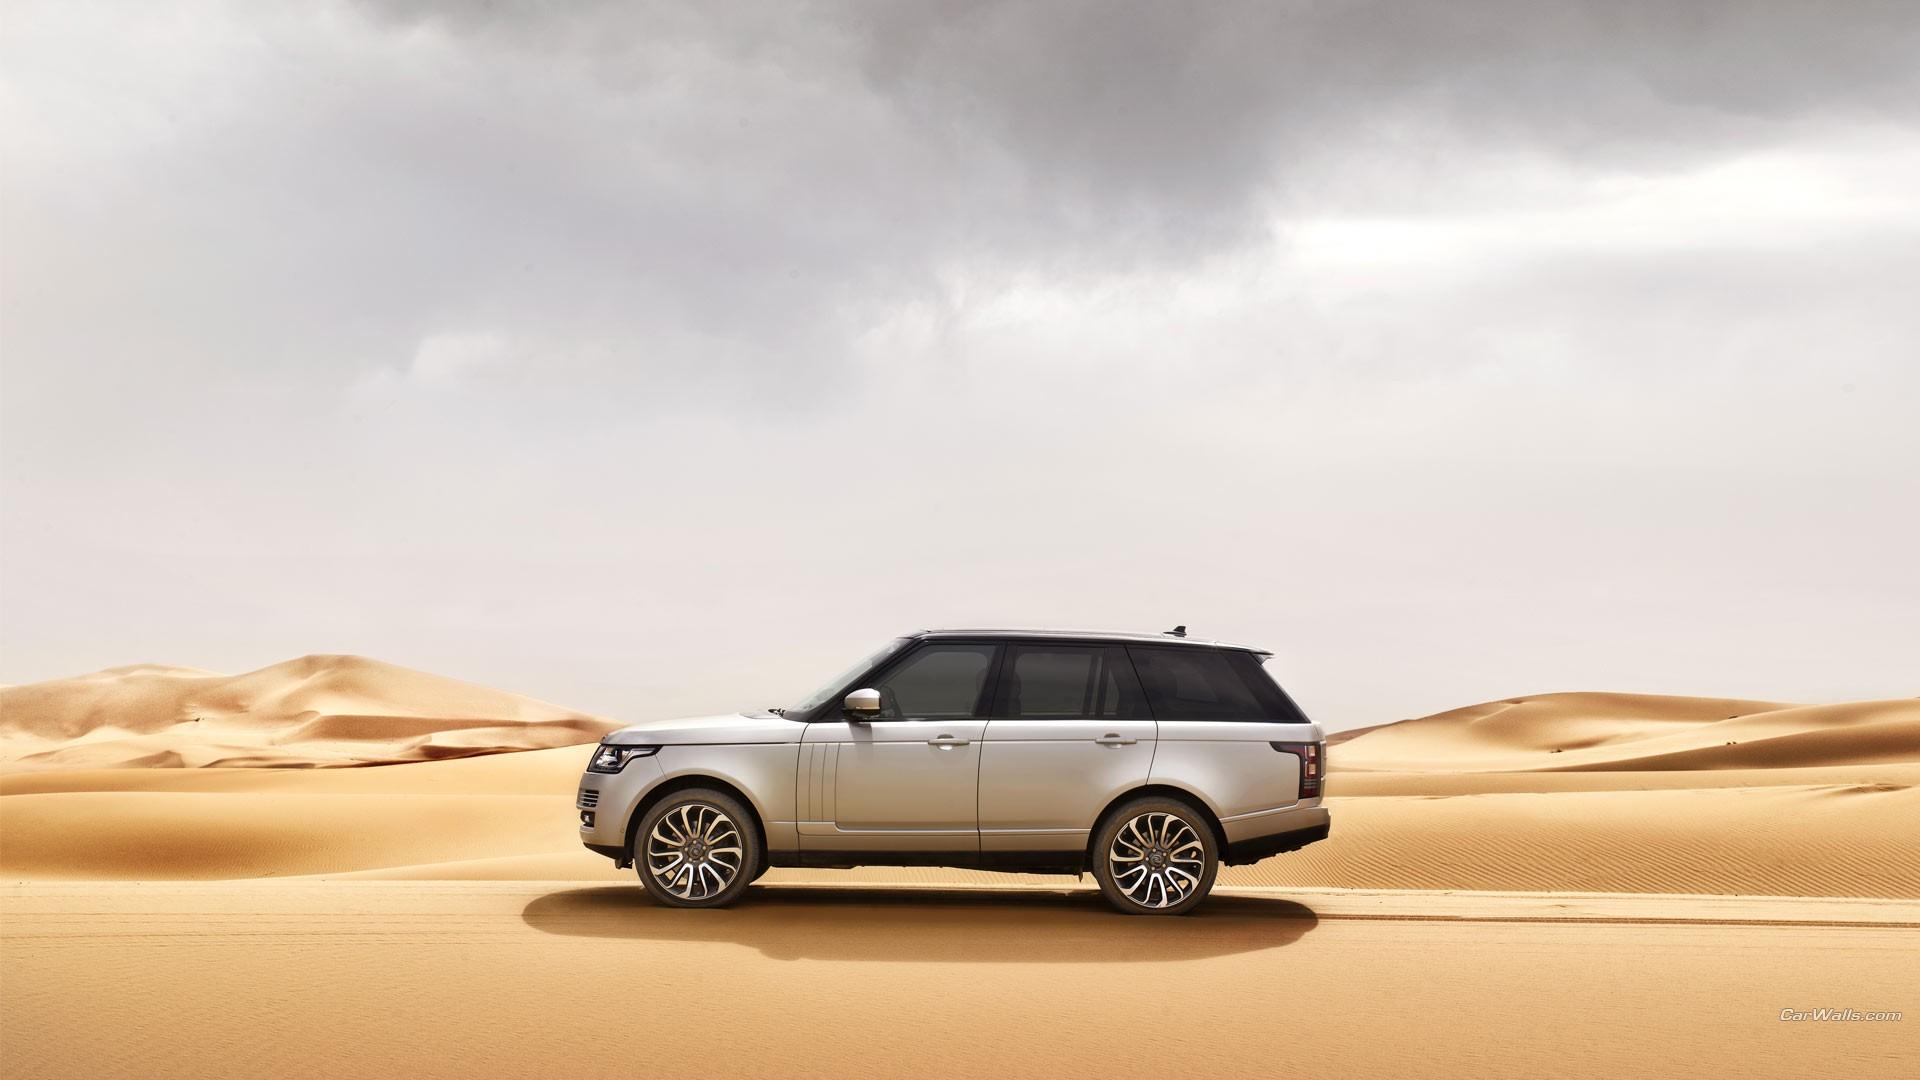 Range Rover Desert Hd Cars 4k Wallpapers Images Backgrounds